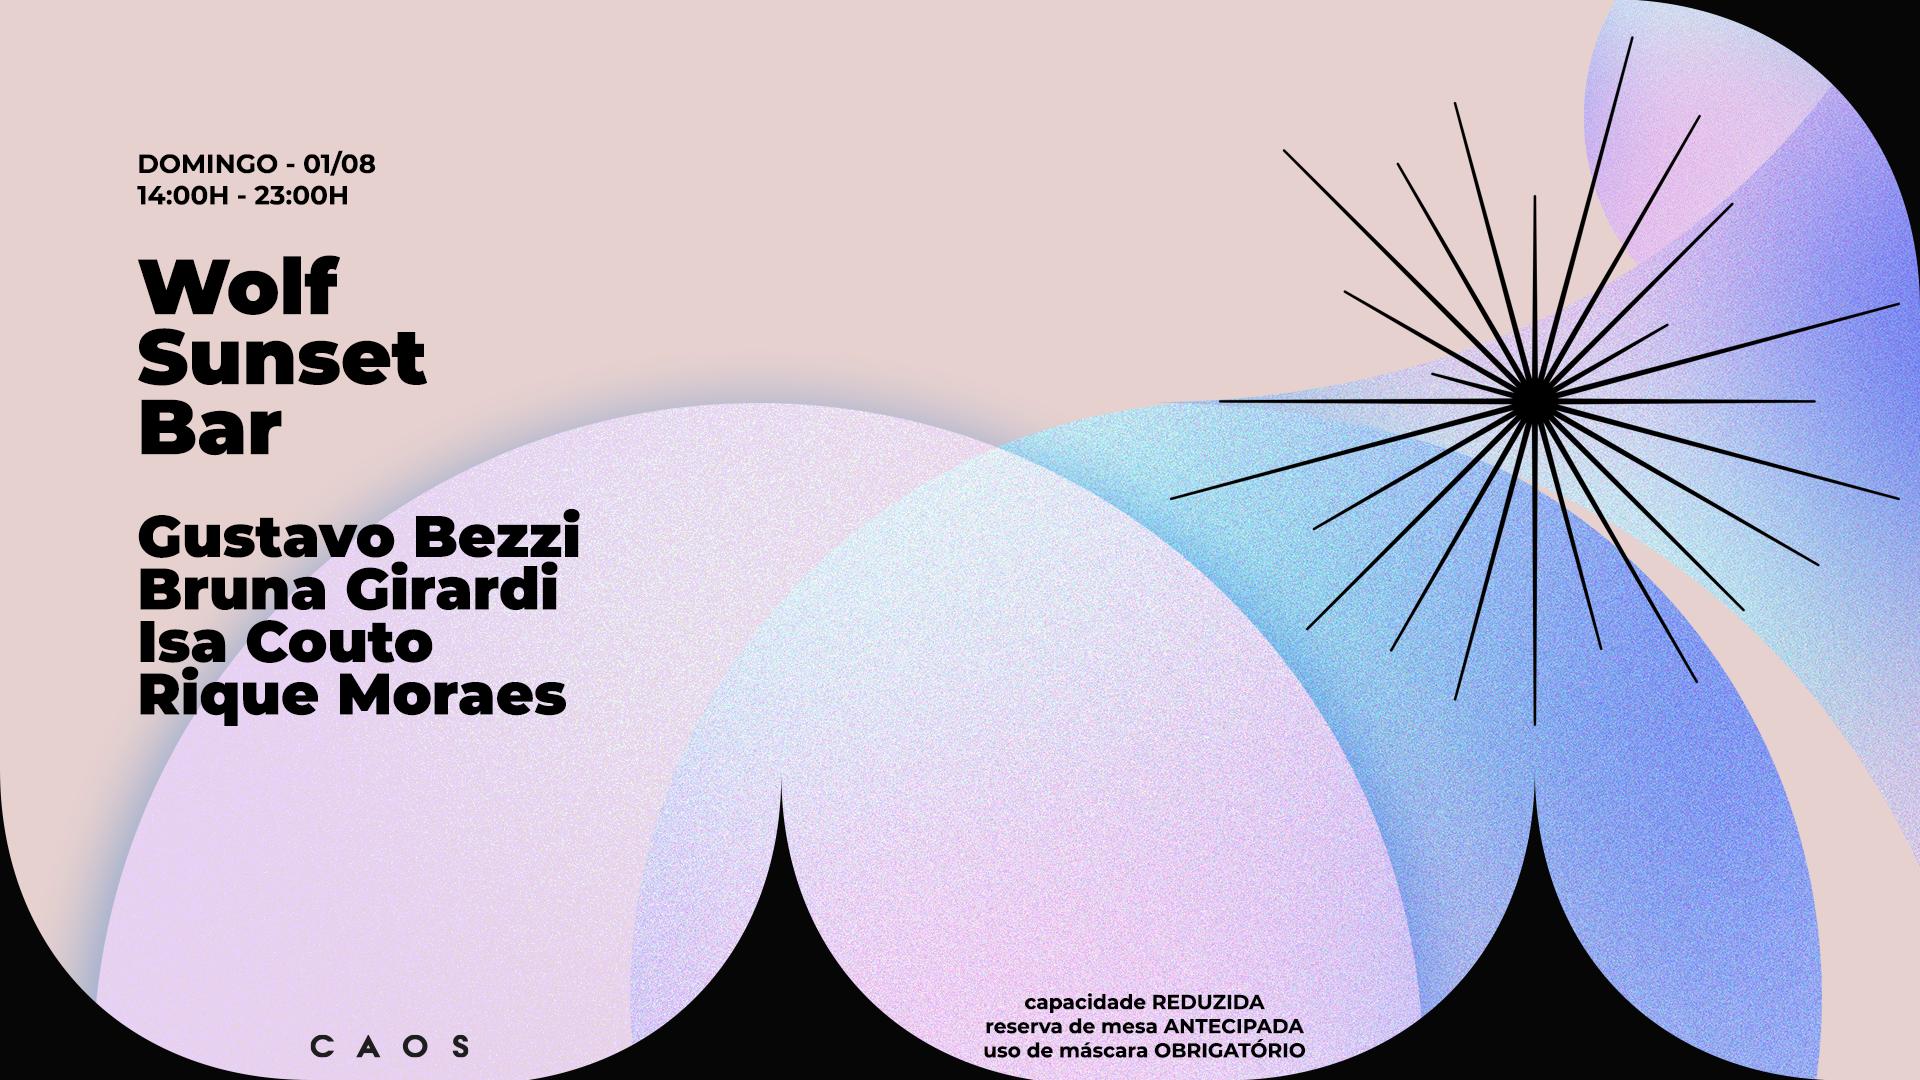 Wolf Sunset Bar com Gustavo Bezzi